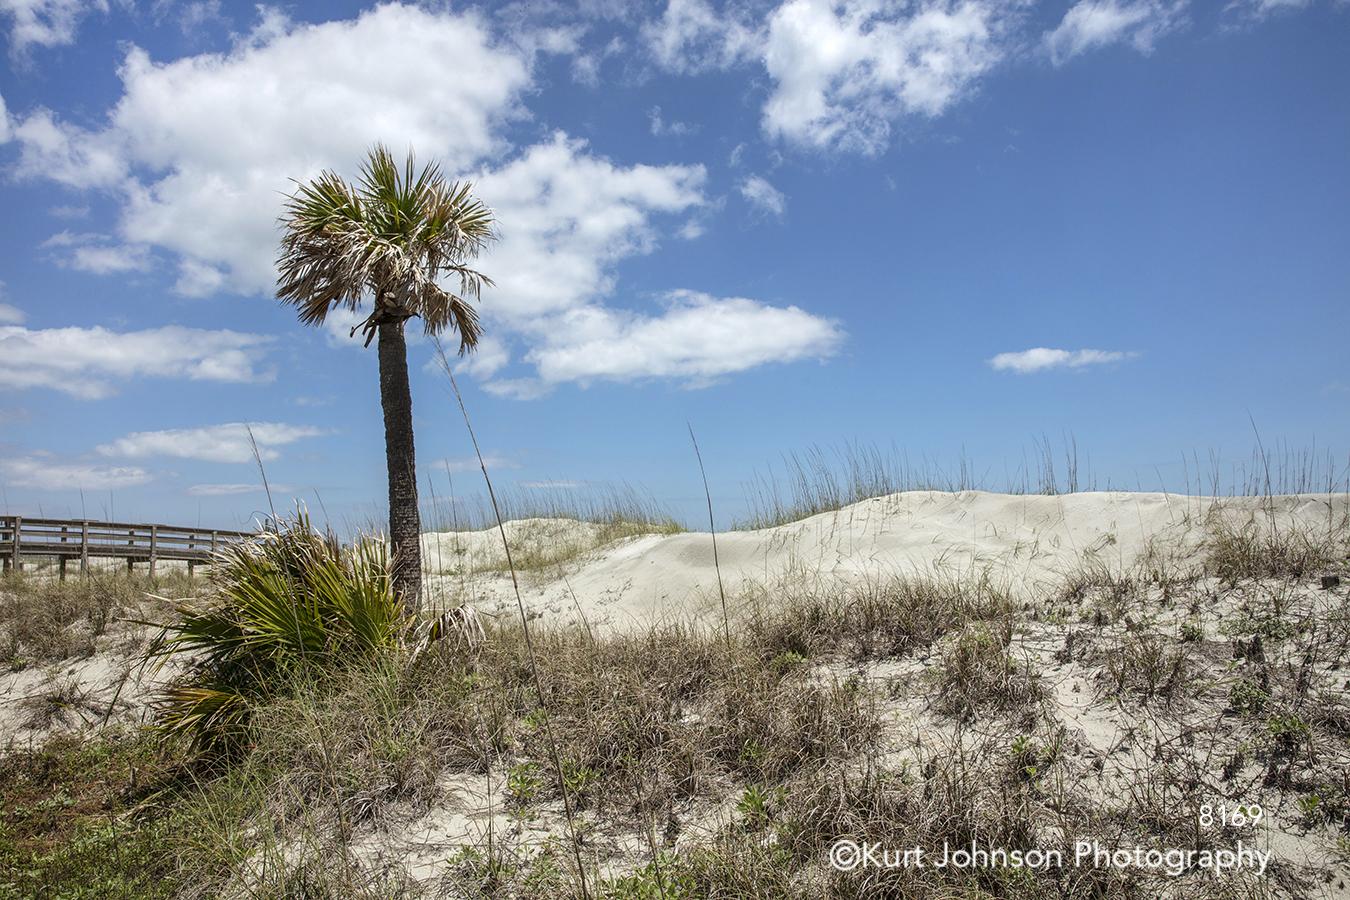 south southeast tree beach shore ocean blue sky clouds landscape